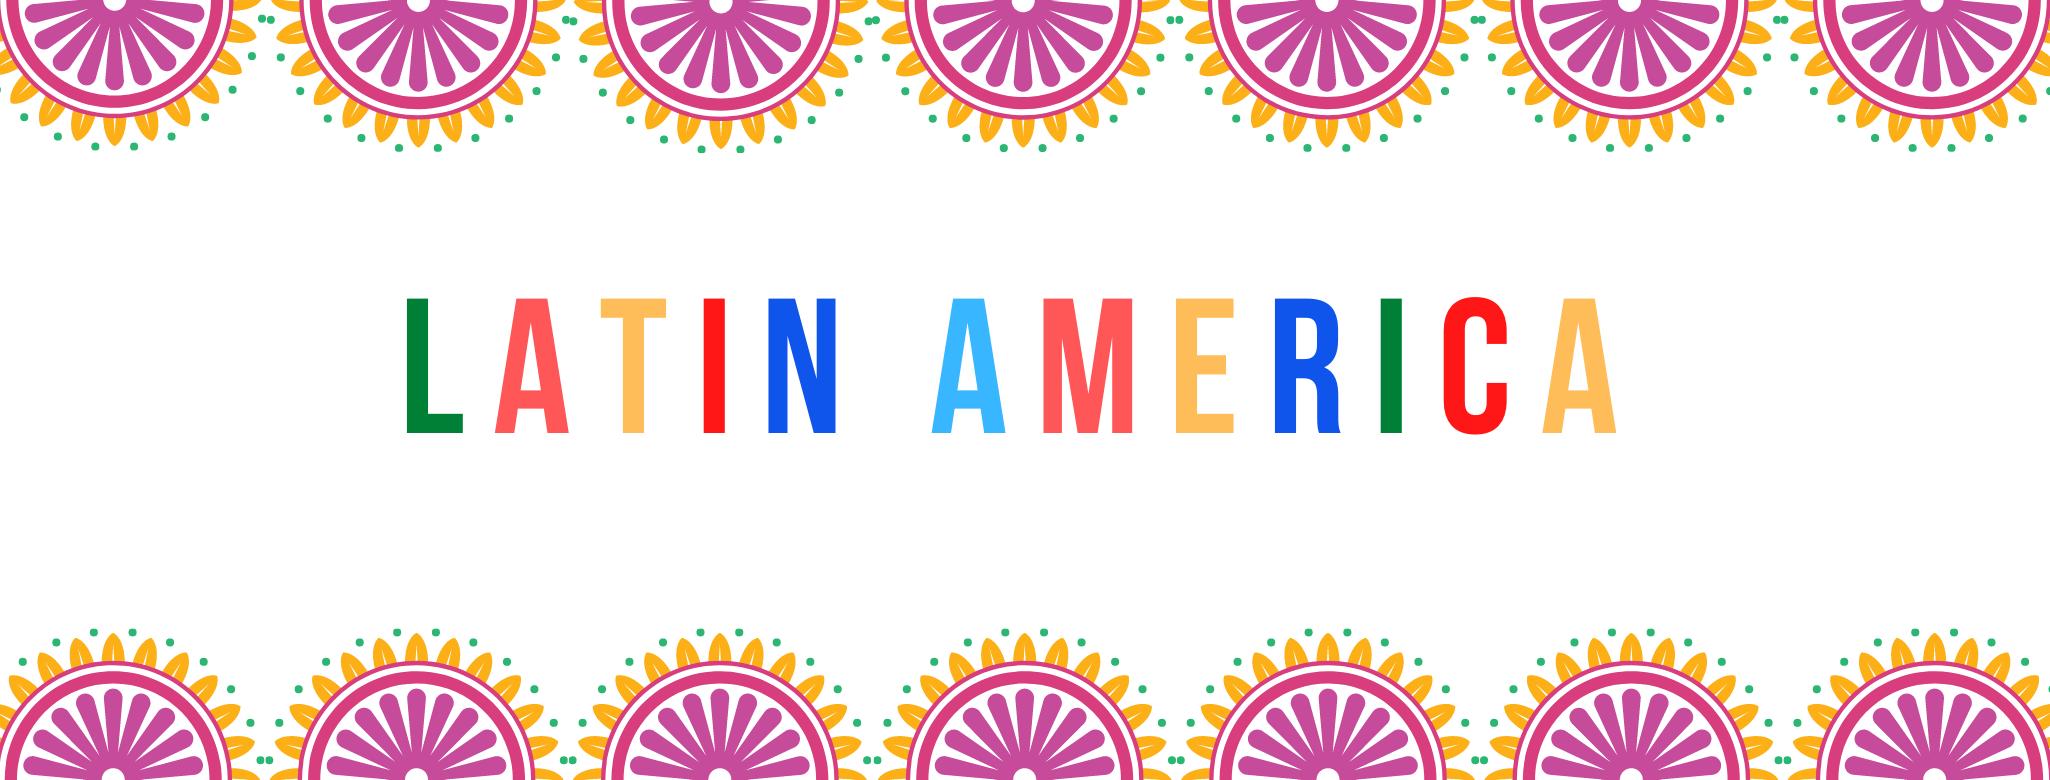 Latin America Banner Art